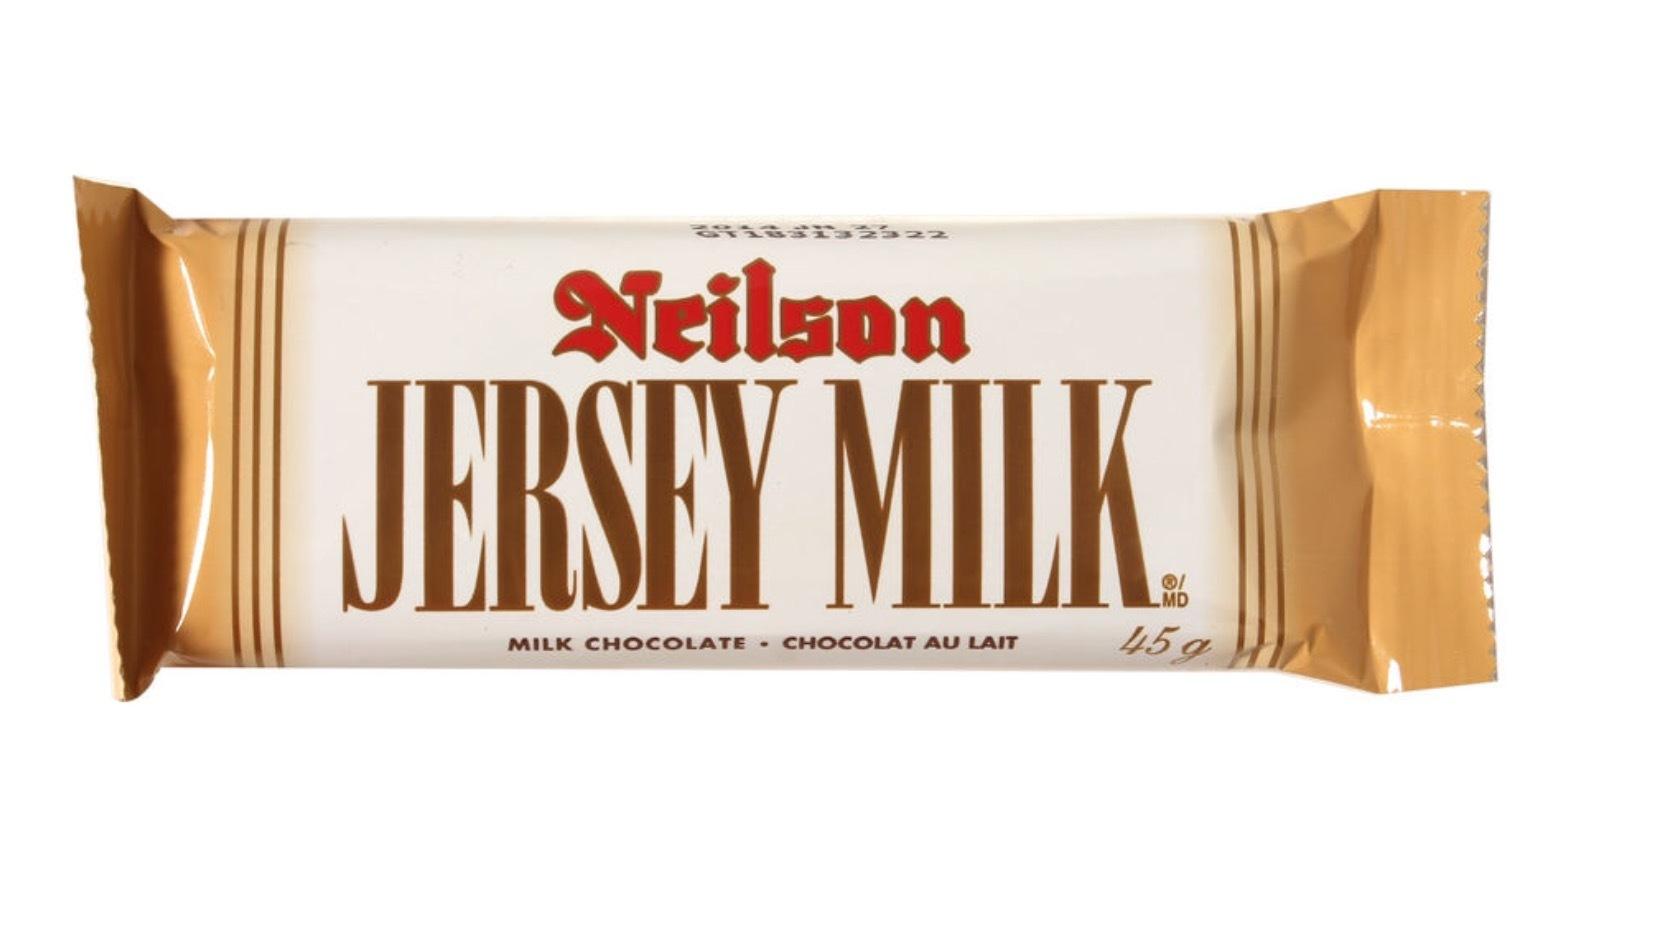 Neilson Jersey Milk Chocolate